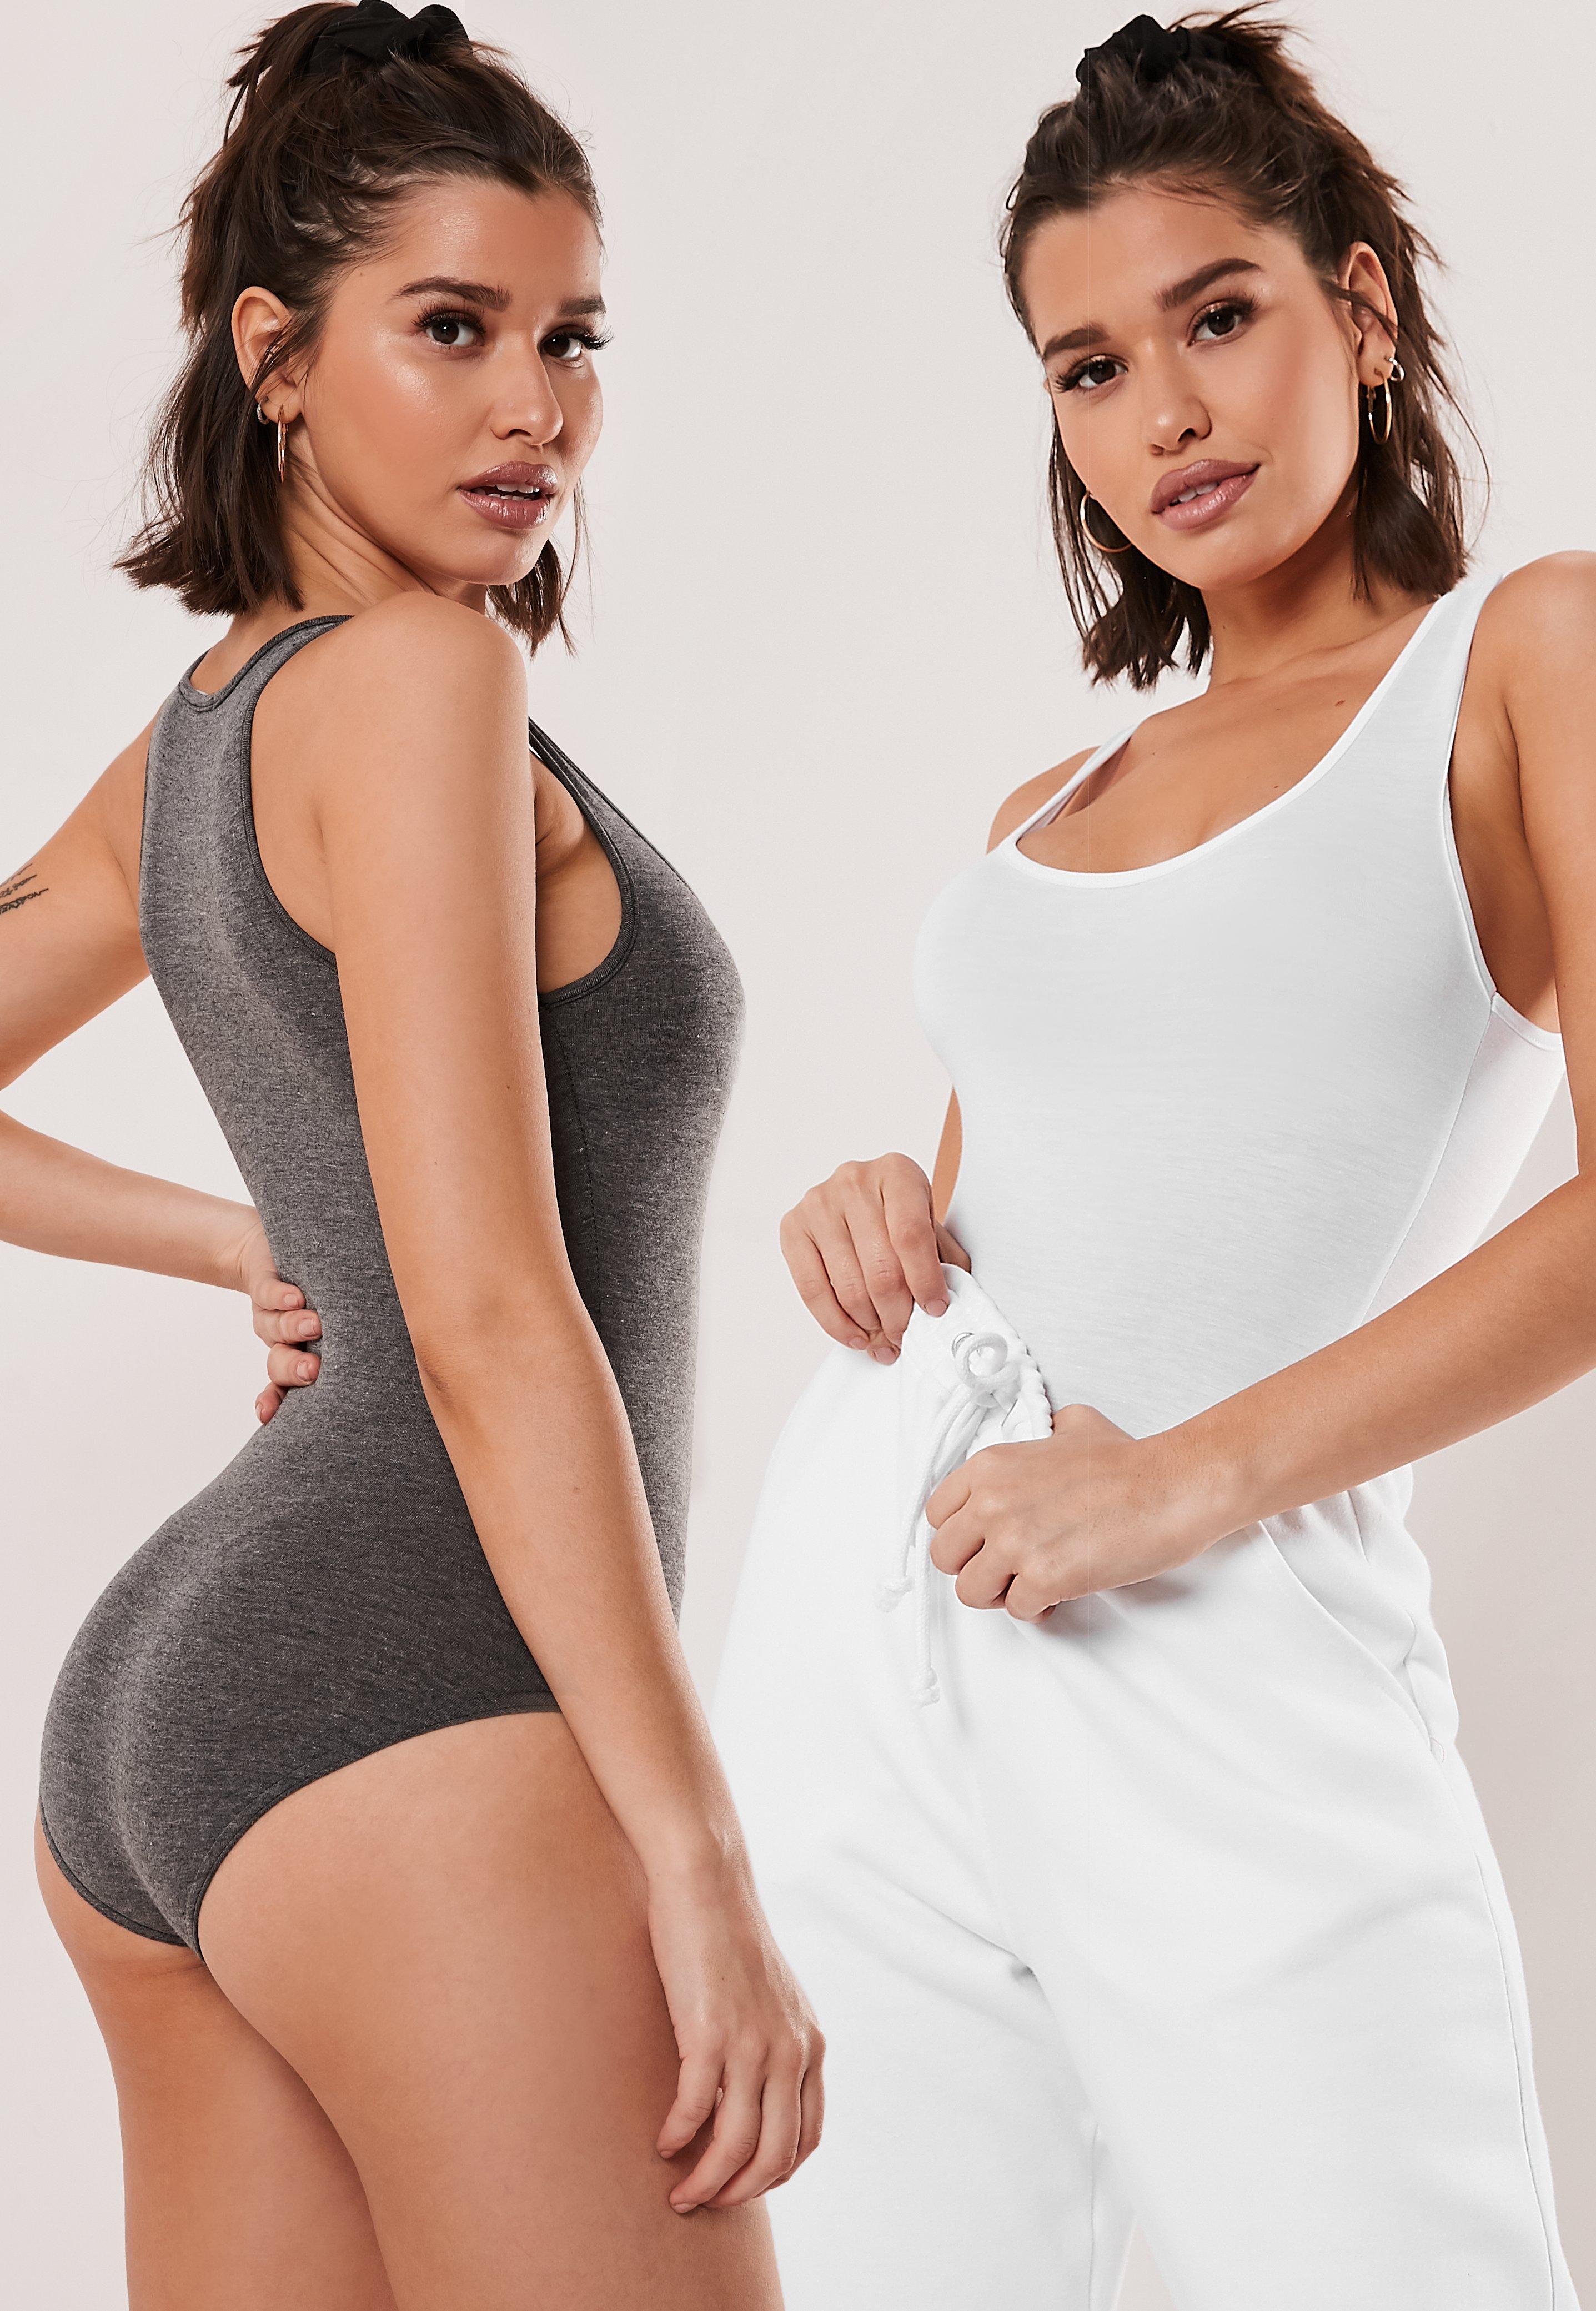 a92160ece7d5 Bodysuits | One Piece Bodysuits - Missguided